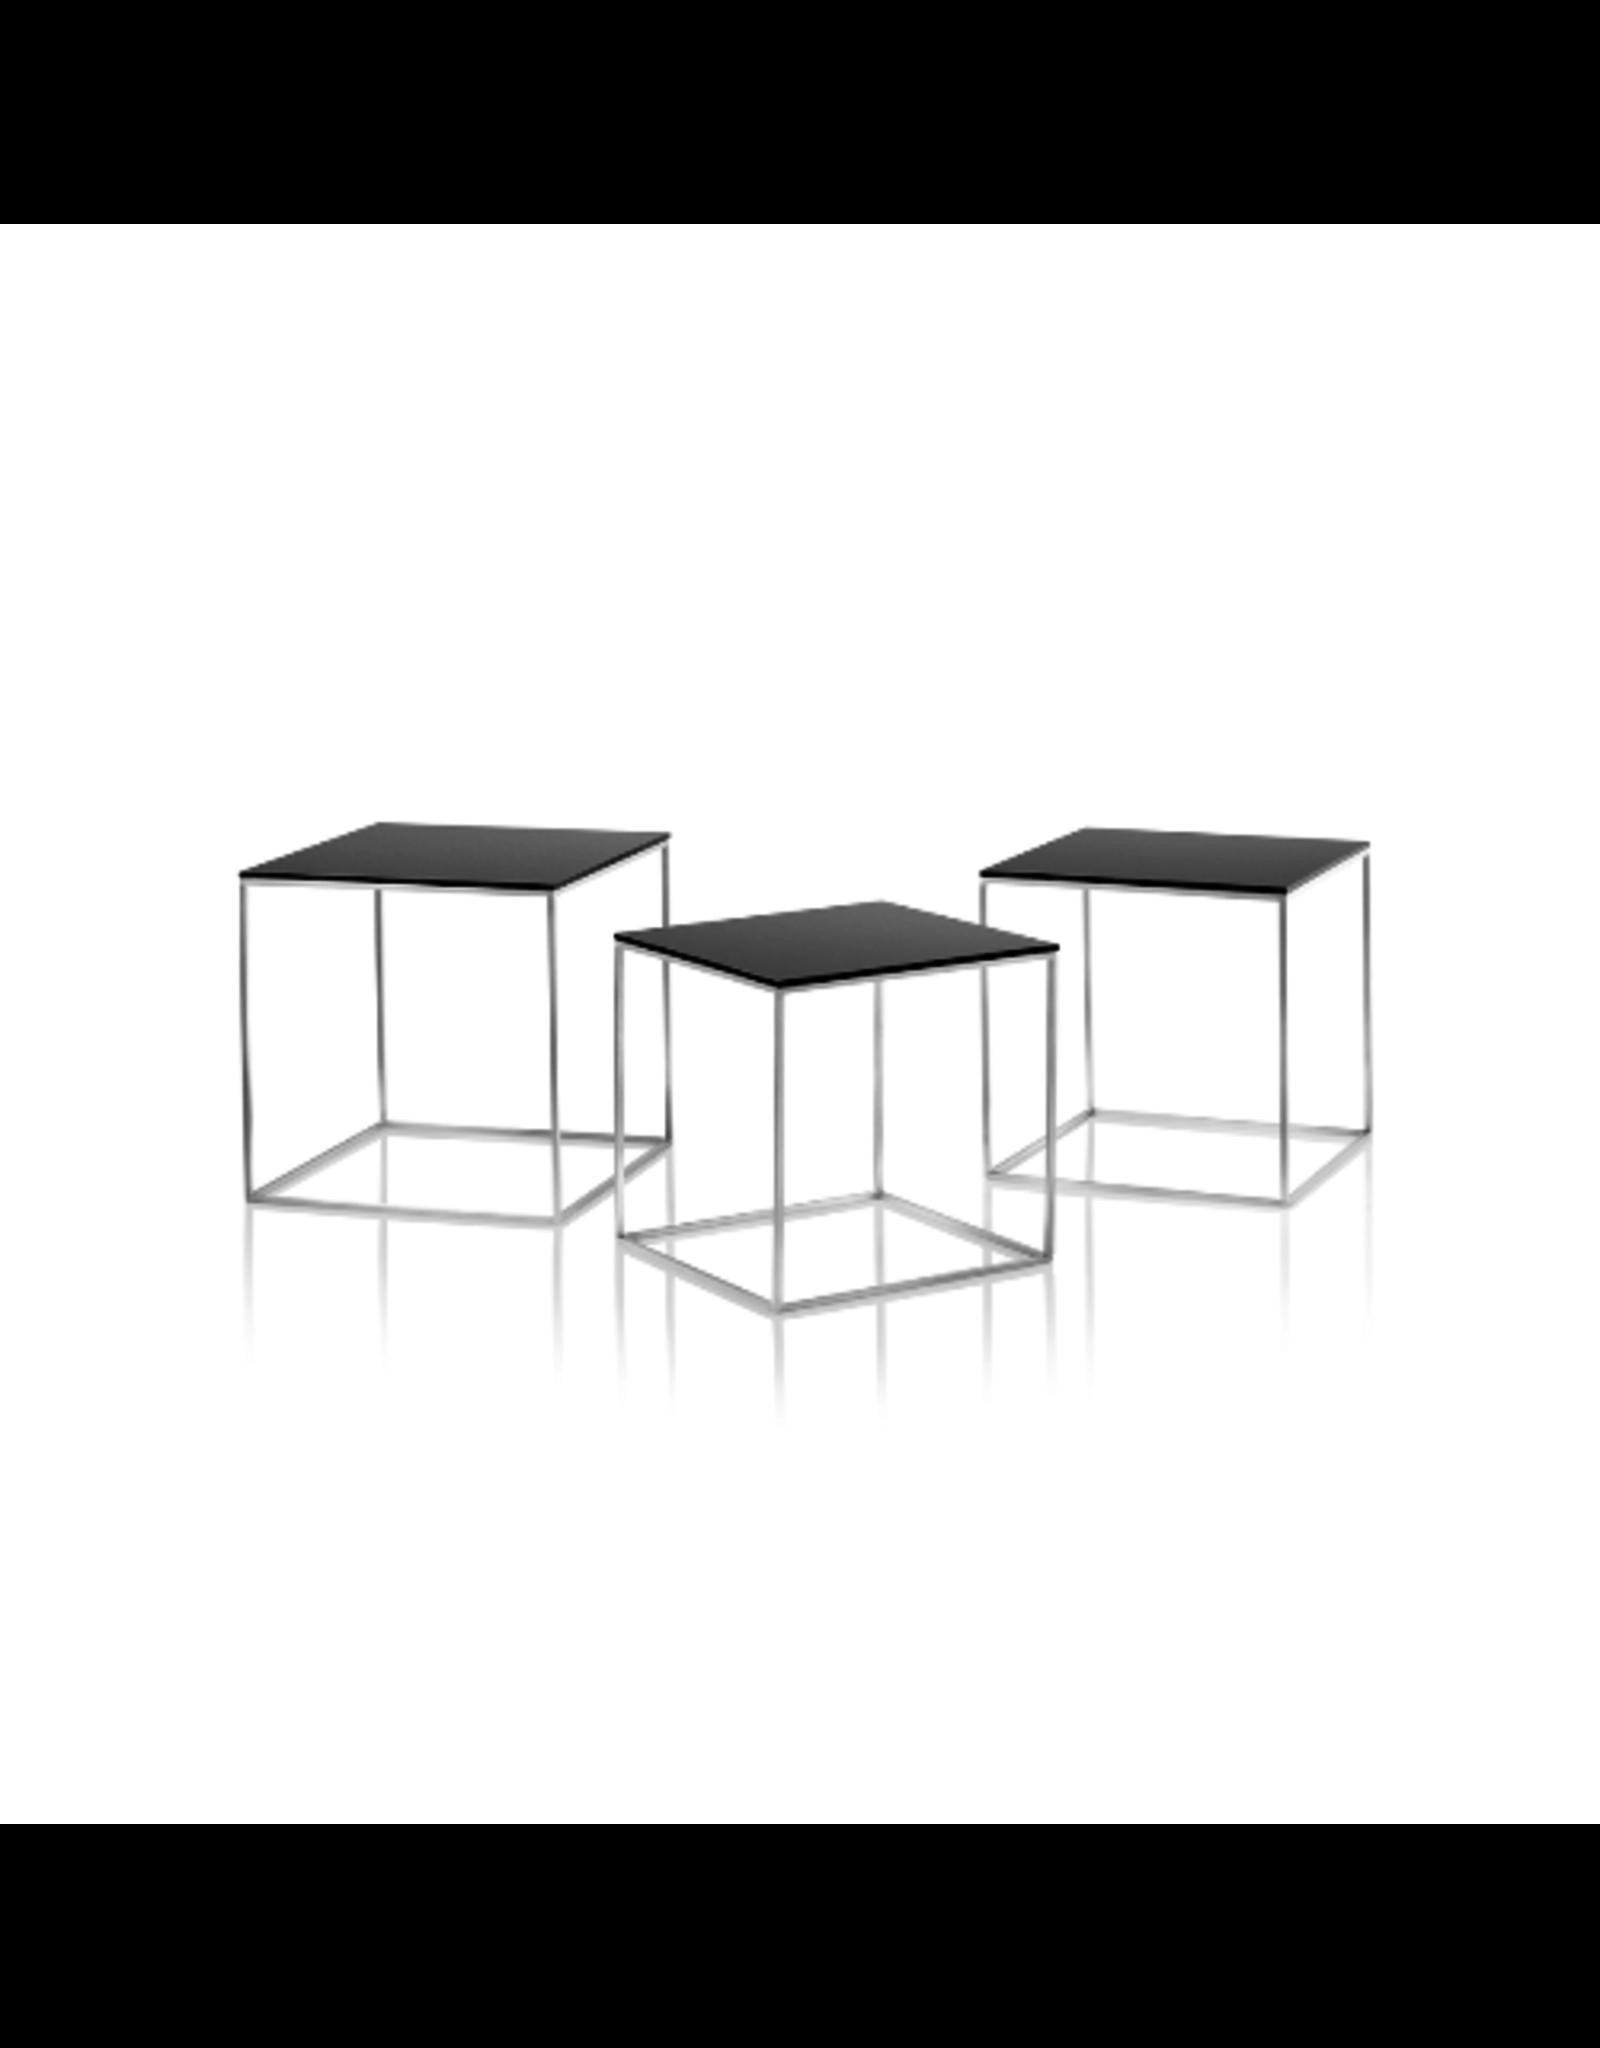 PK71 嵌套邊桌三件套